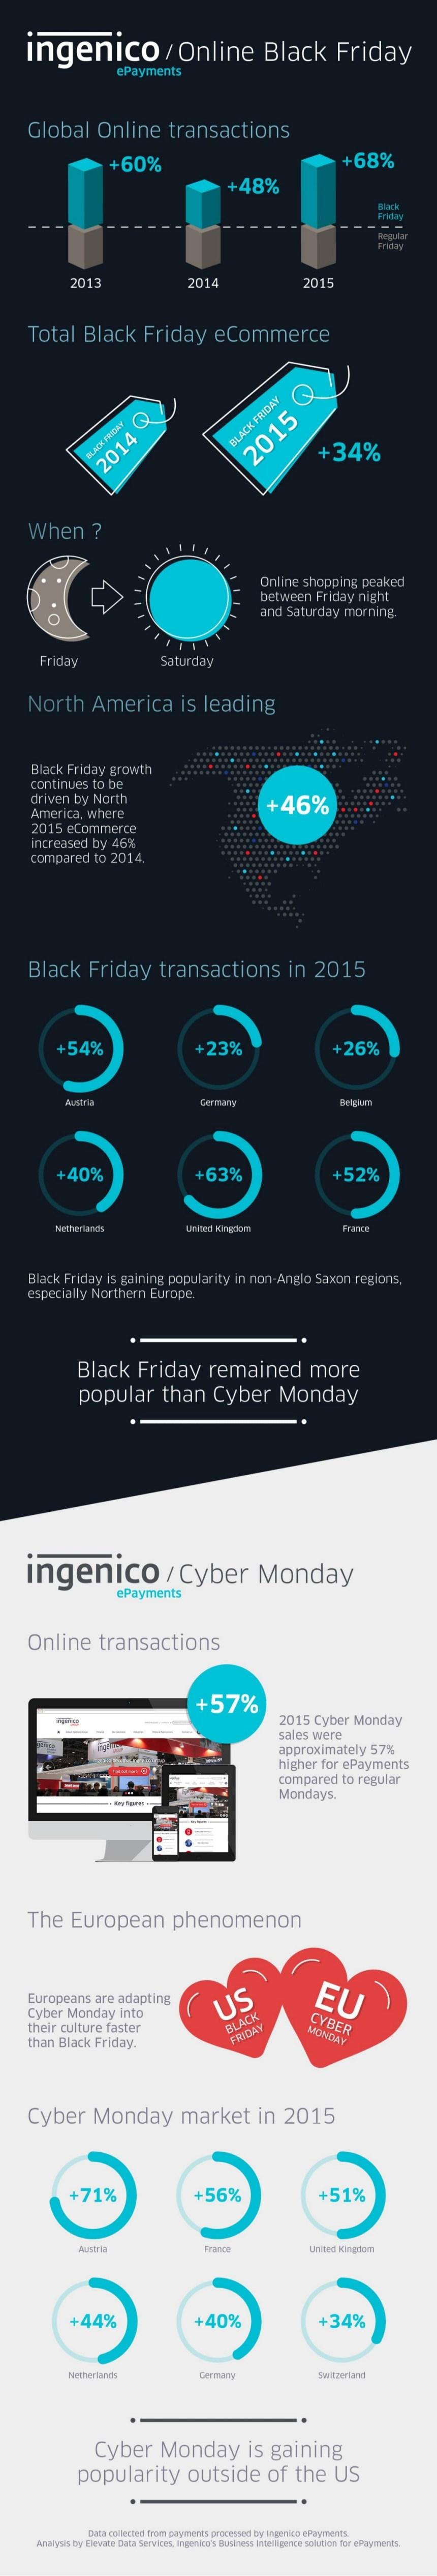 black-friday-y-cyber-monday-infografia